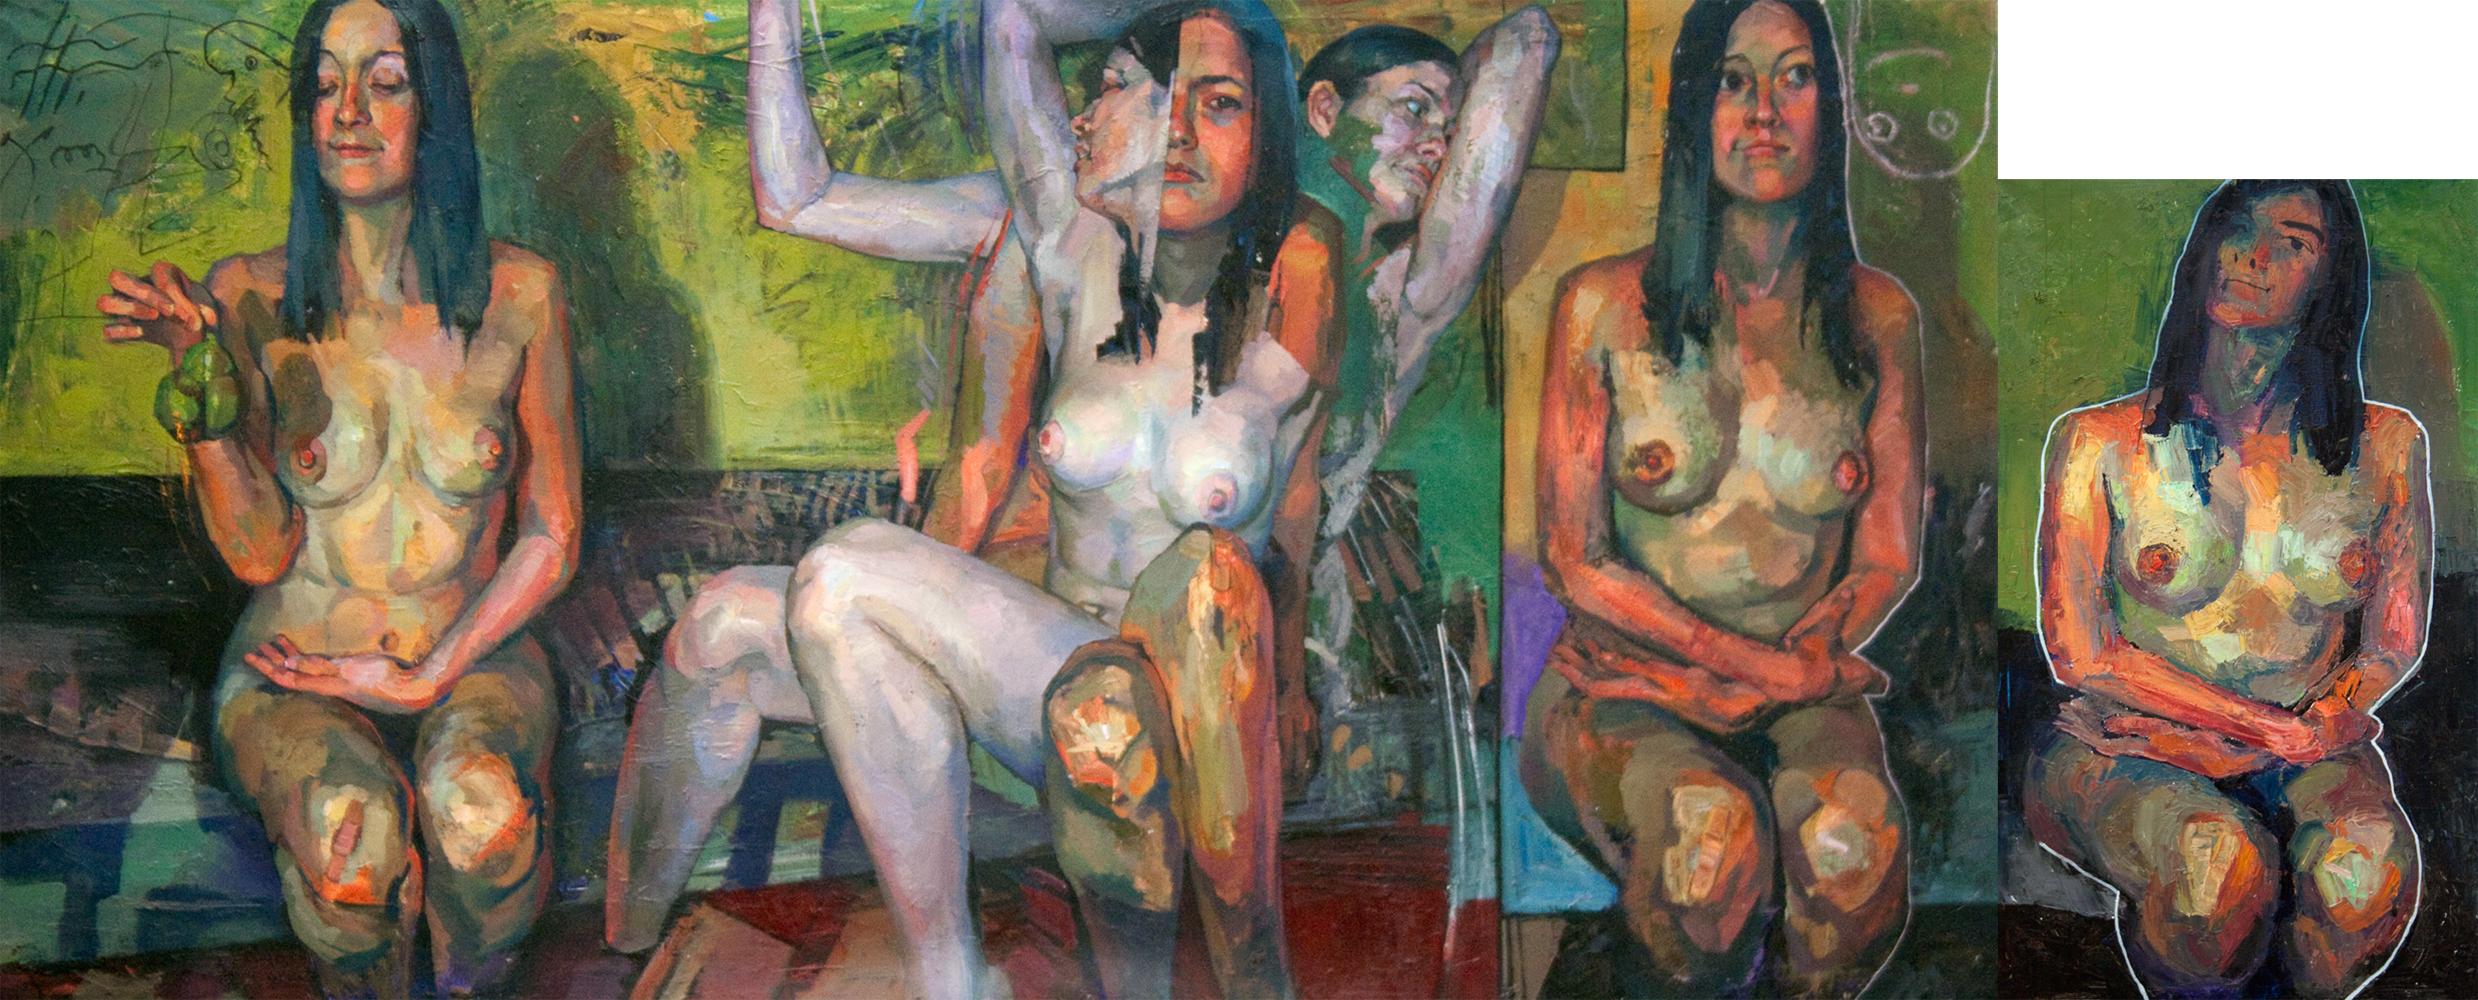 """Regular Variations I"" 2016 Oil on canvas 138 x 270cm SOLD"